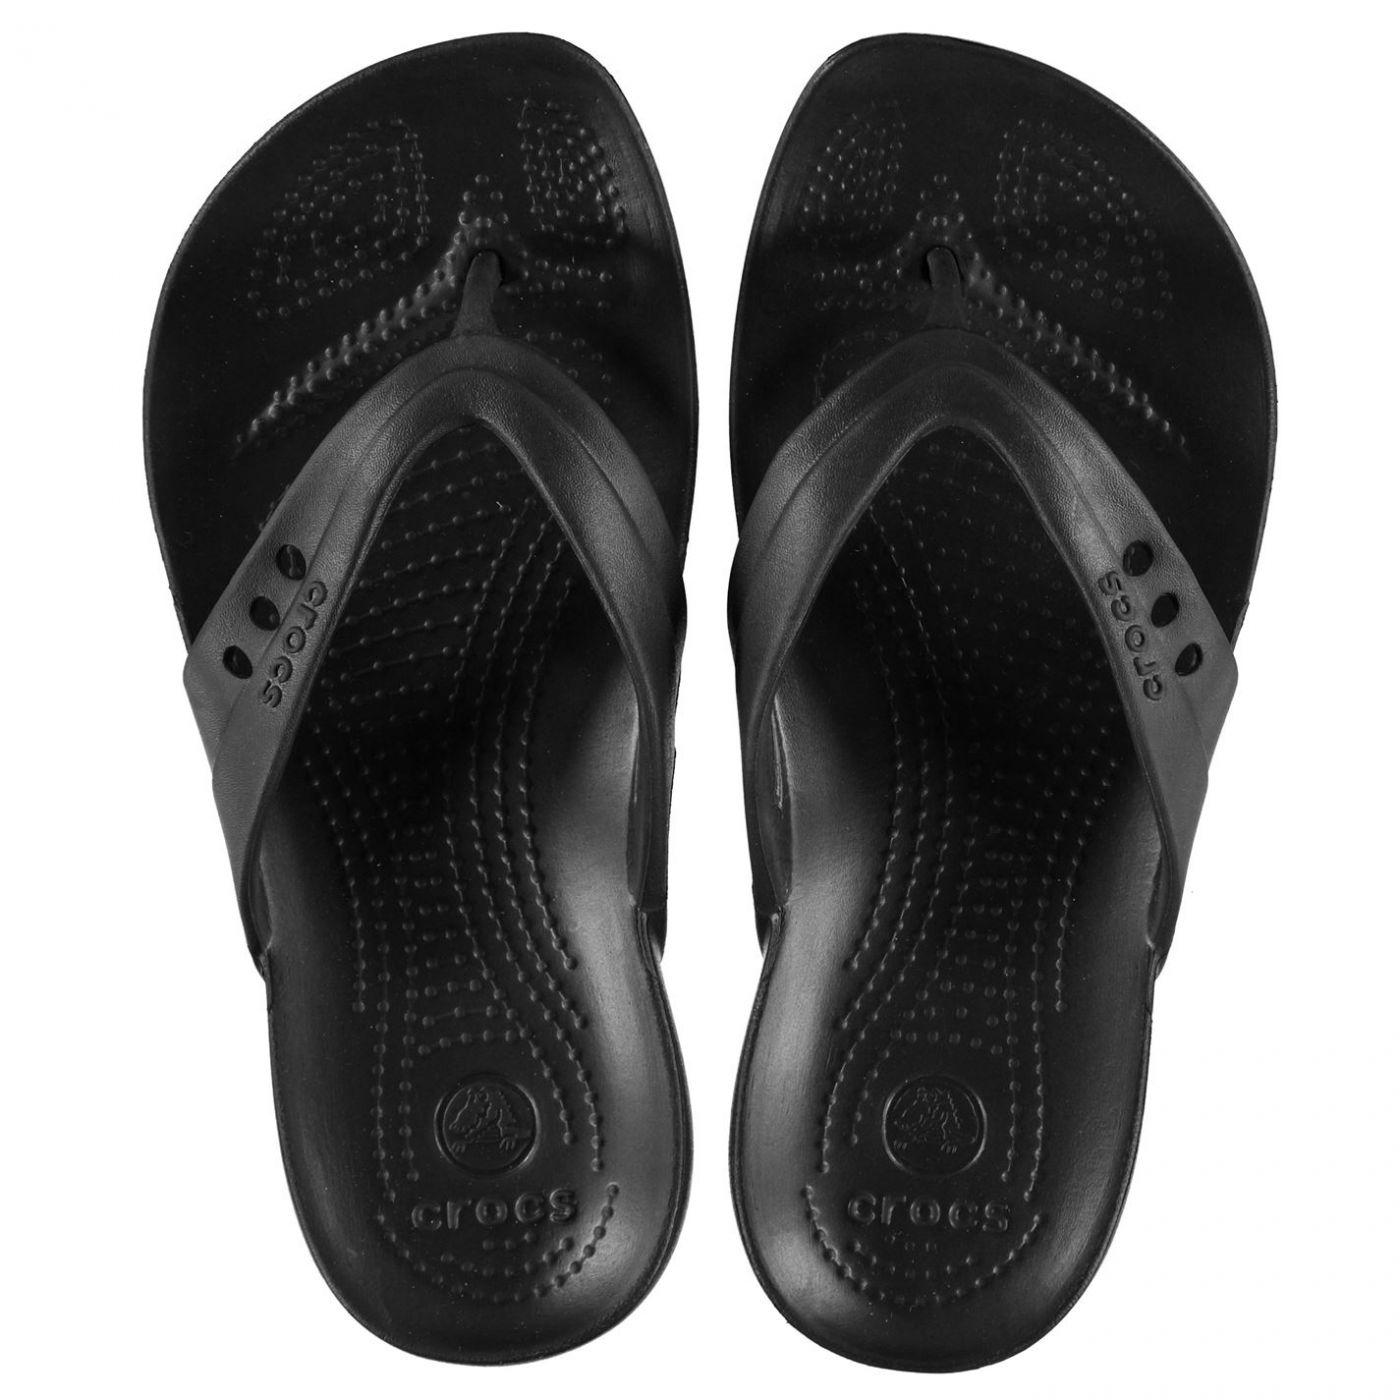 Crocs Kadee Ladies Flip Flops